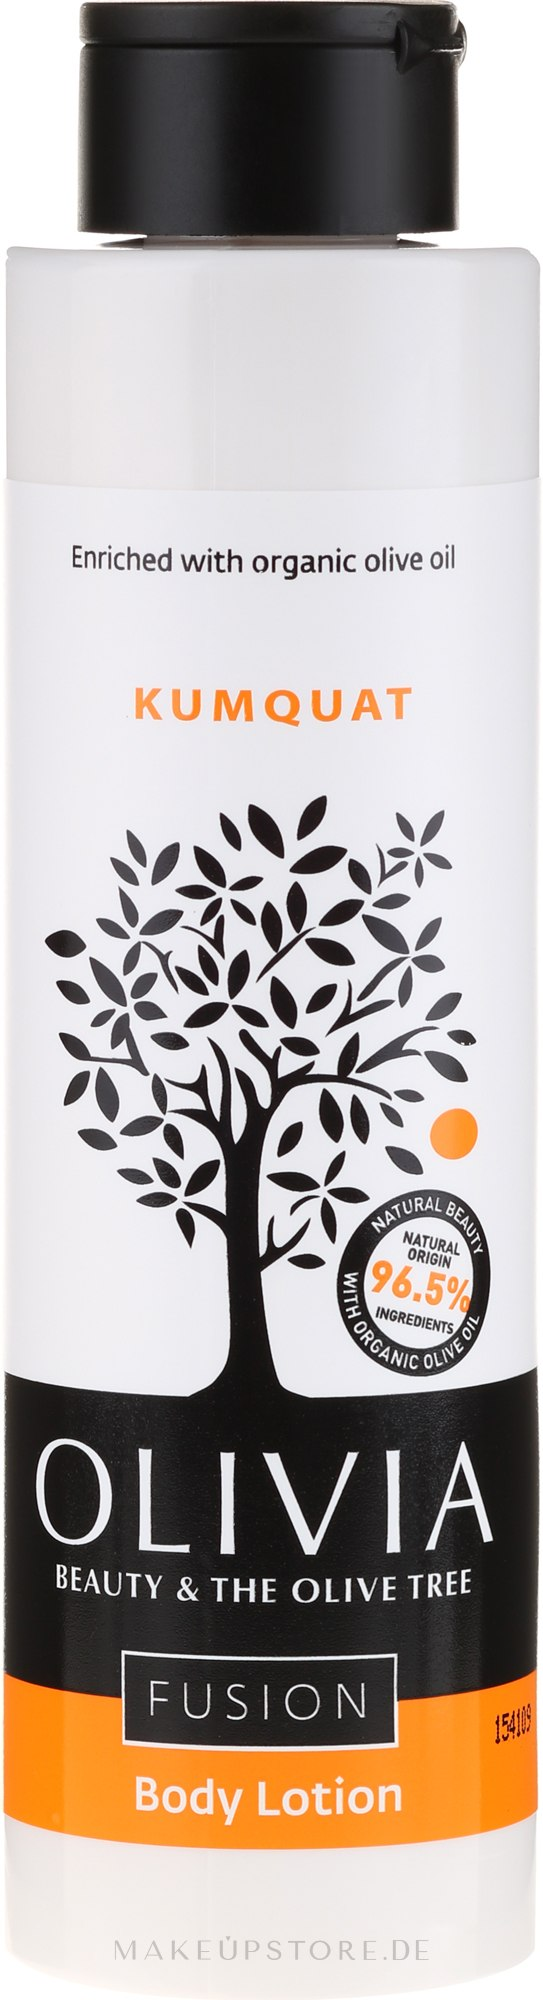 Körperlotion mit Kumquatextrakt - Olivia Beauty & The Olive Fusion Body Lotion Kumquat — Bild 300 ml